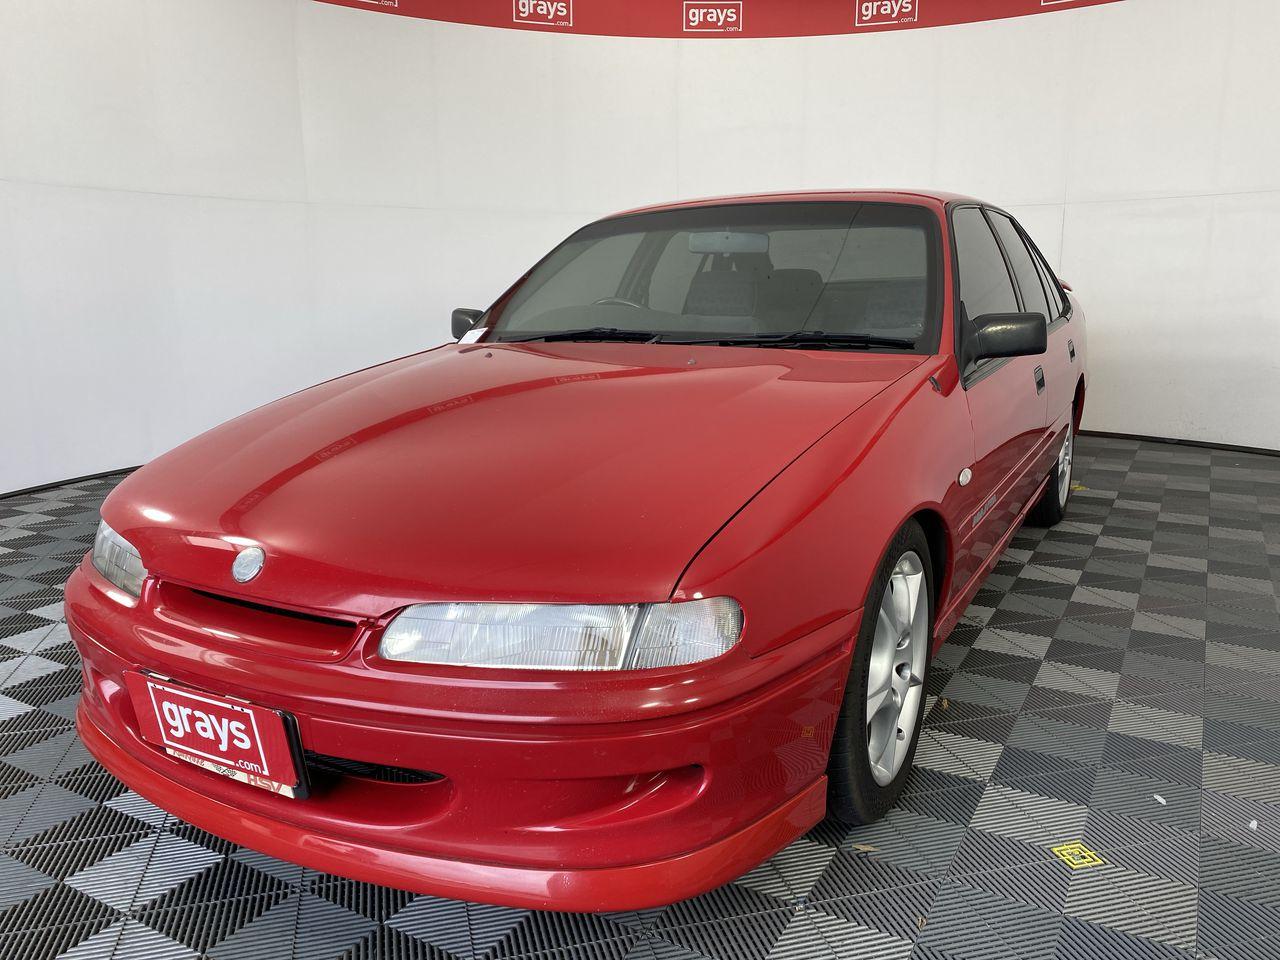 1995 HSV MANTA VS Manual Sedan